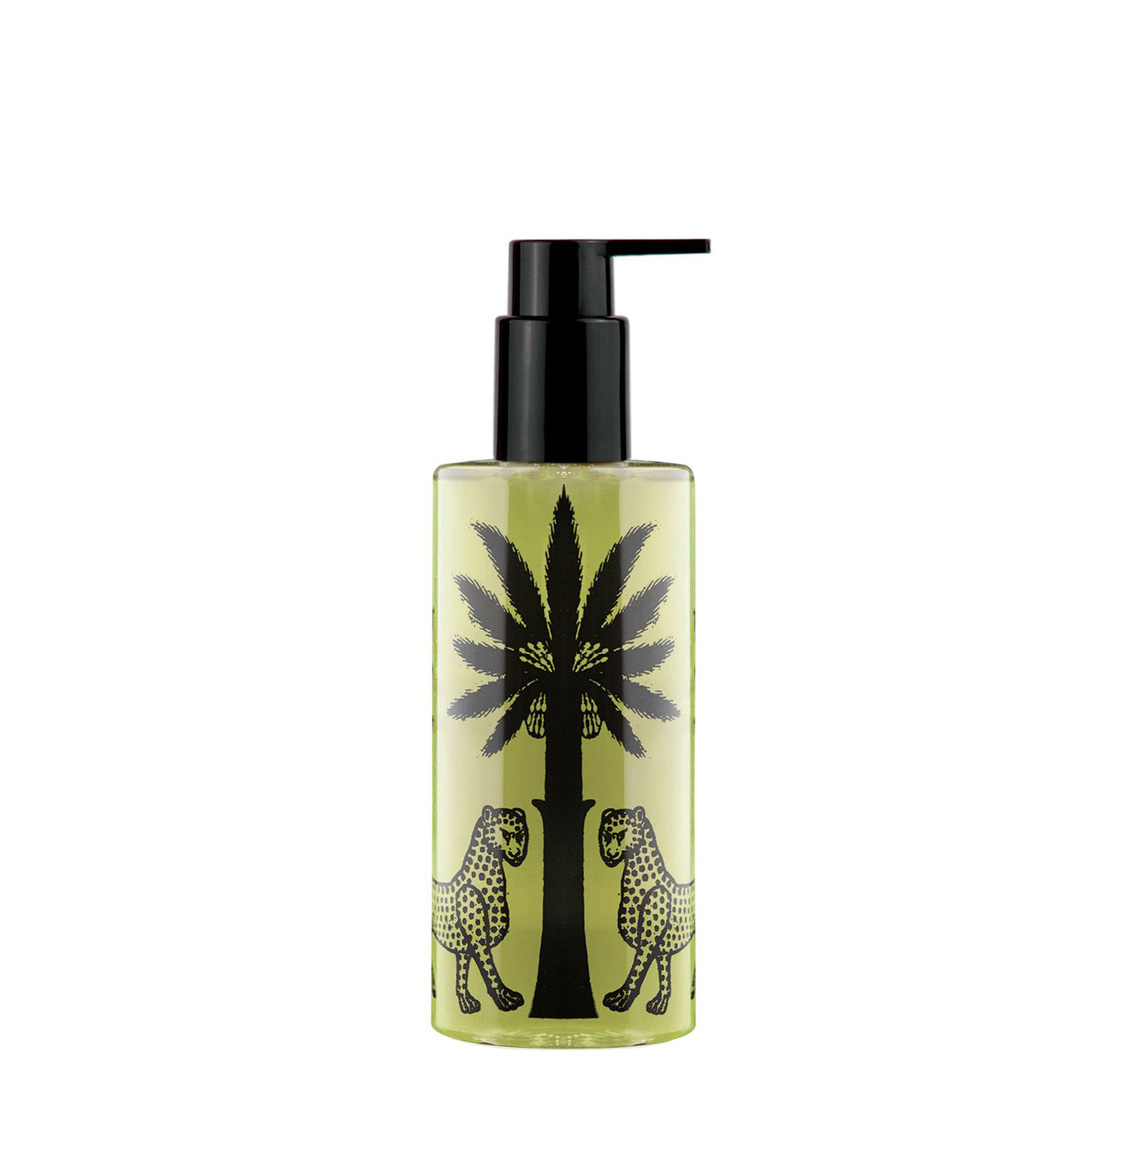 Ortigia Sicilia Bergamot Shower Gel 250ml